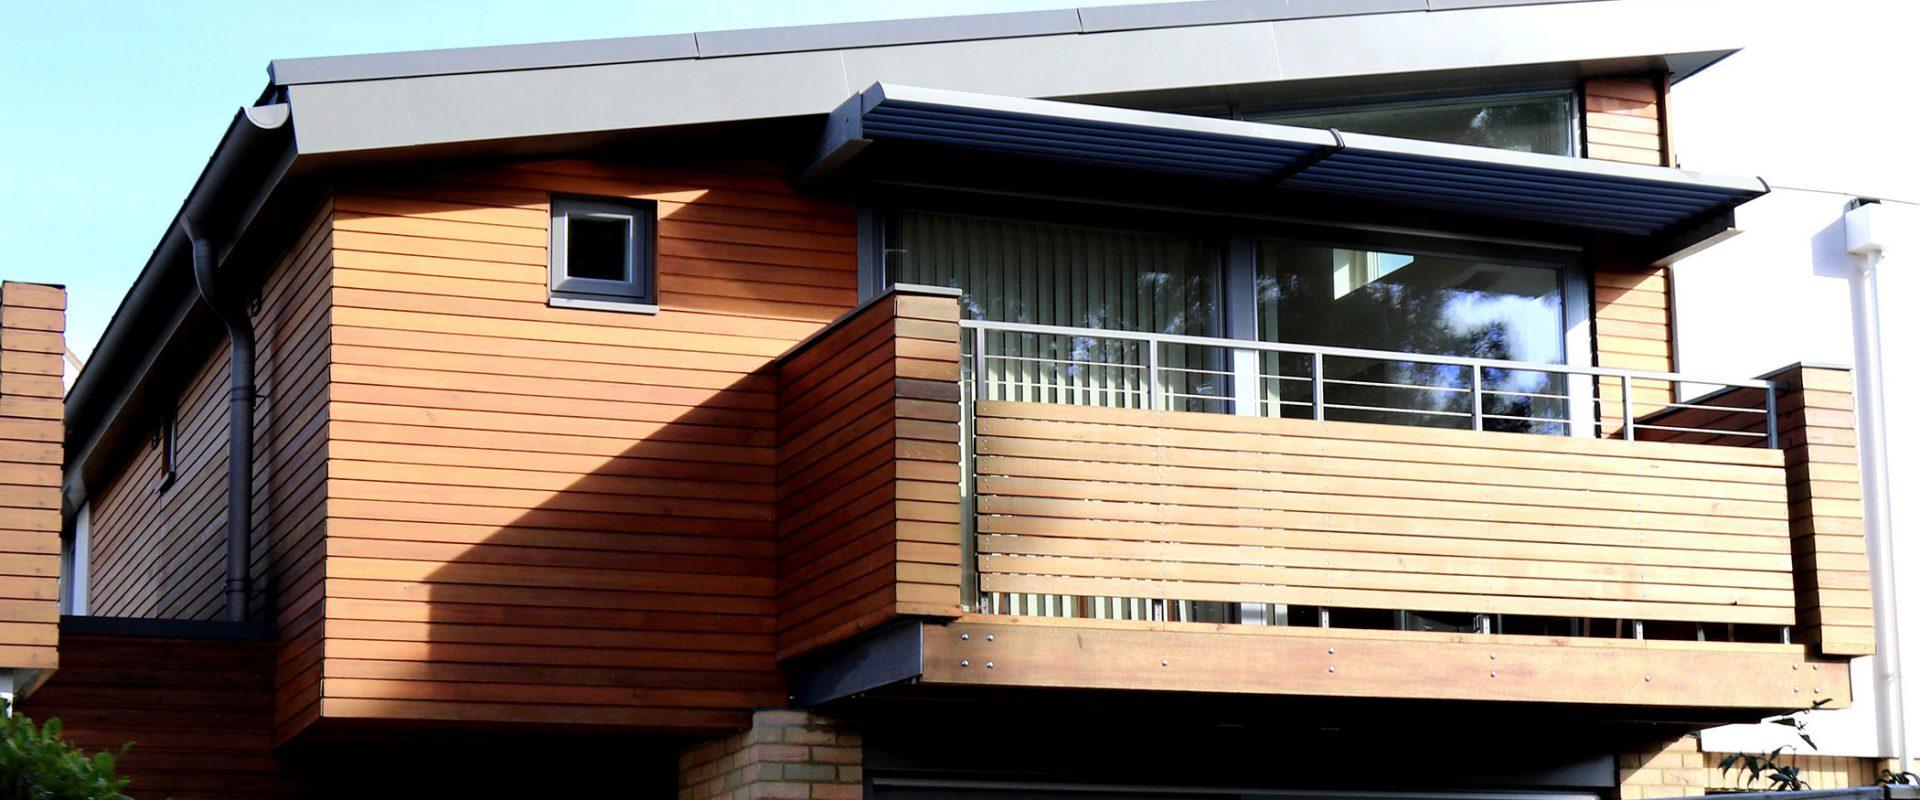 apartment-architectural-design-architecture-323774.jpg